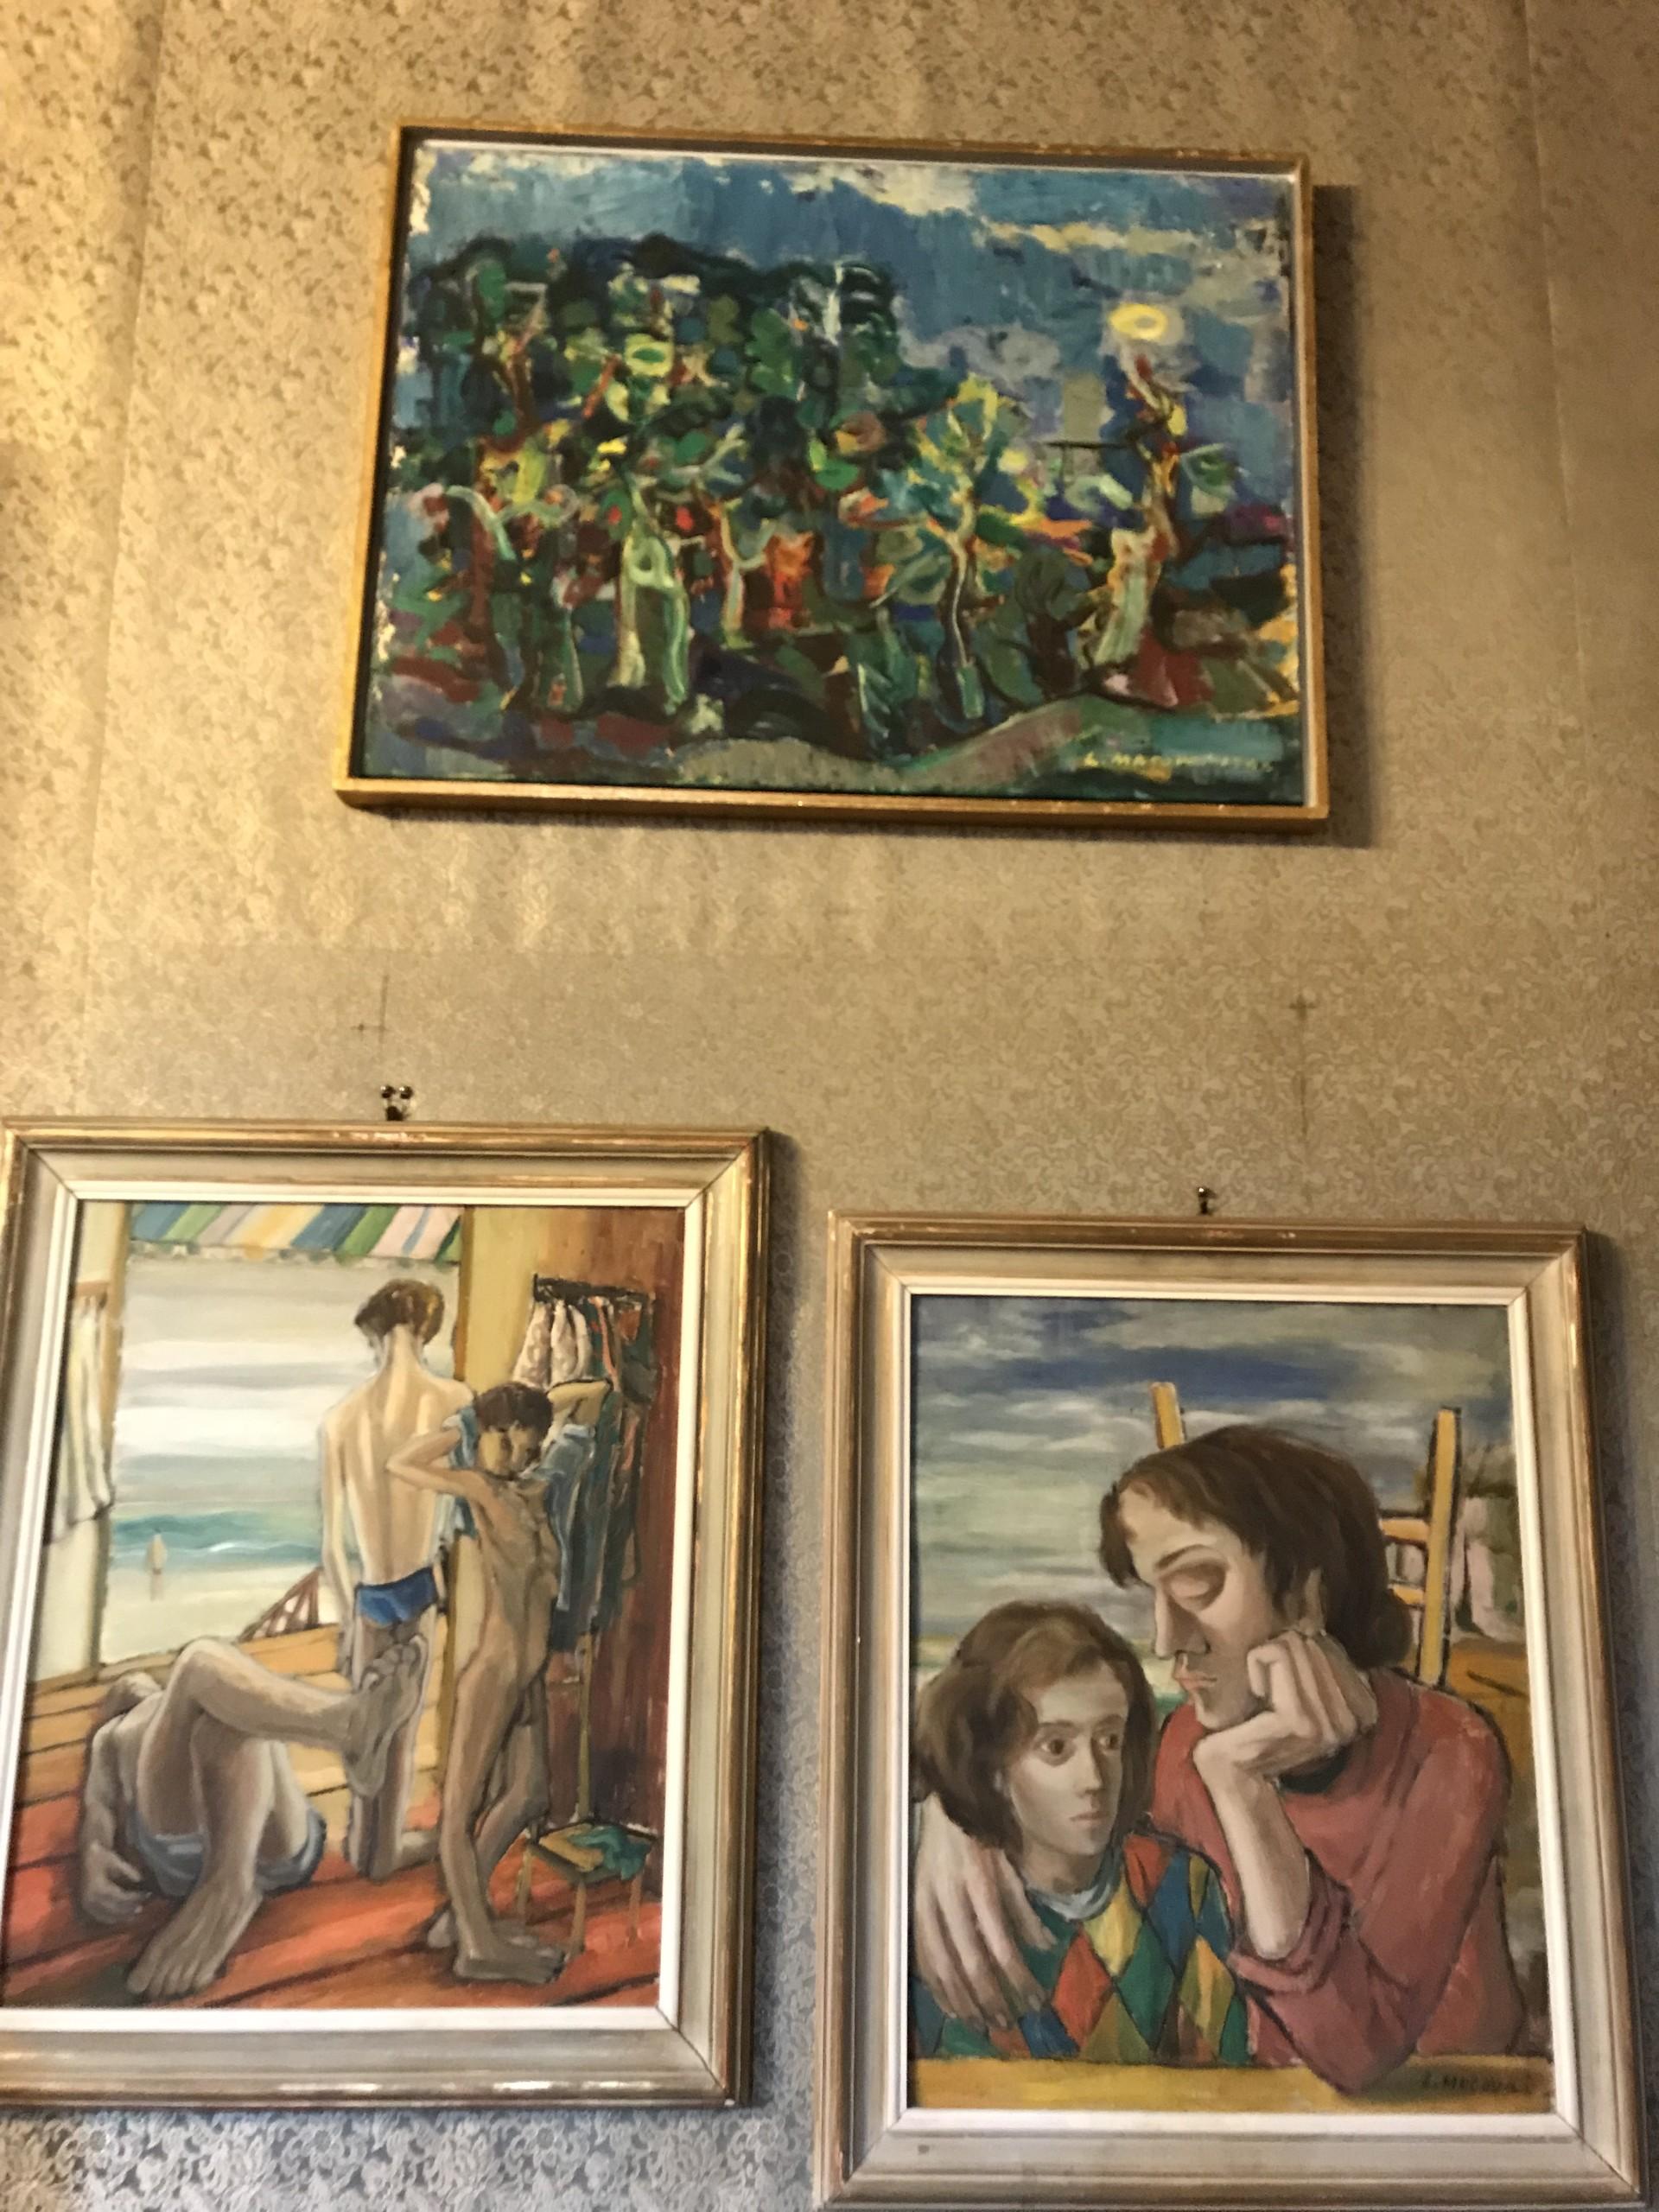 collezione-darte-ligia-pompiliu-macovei-